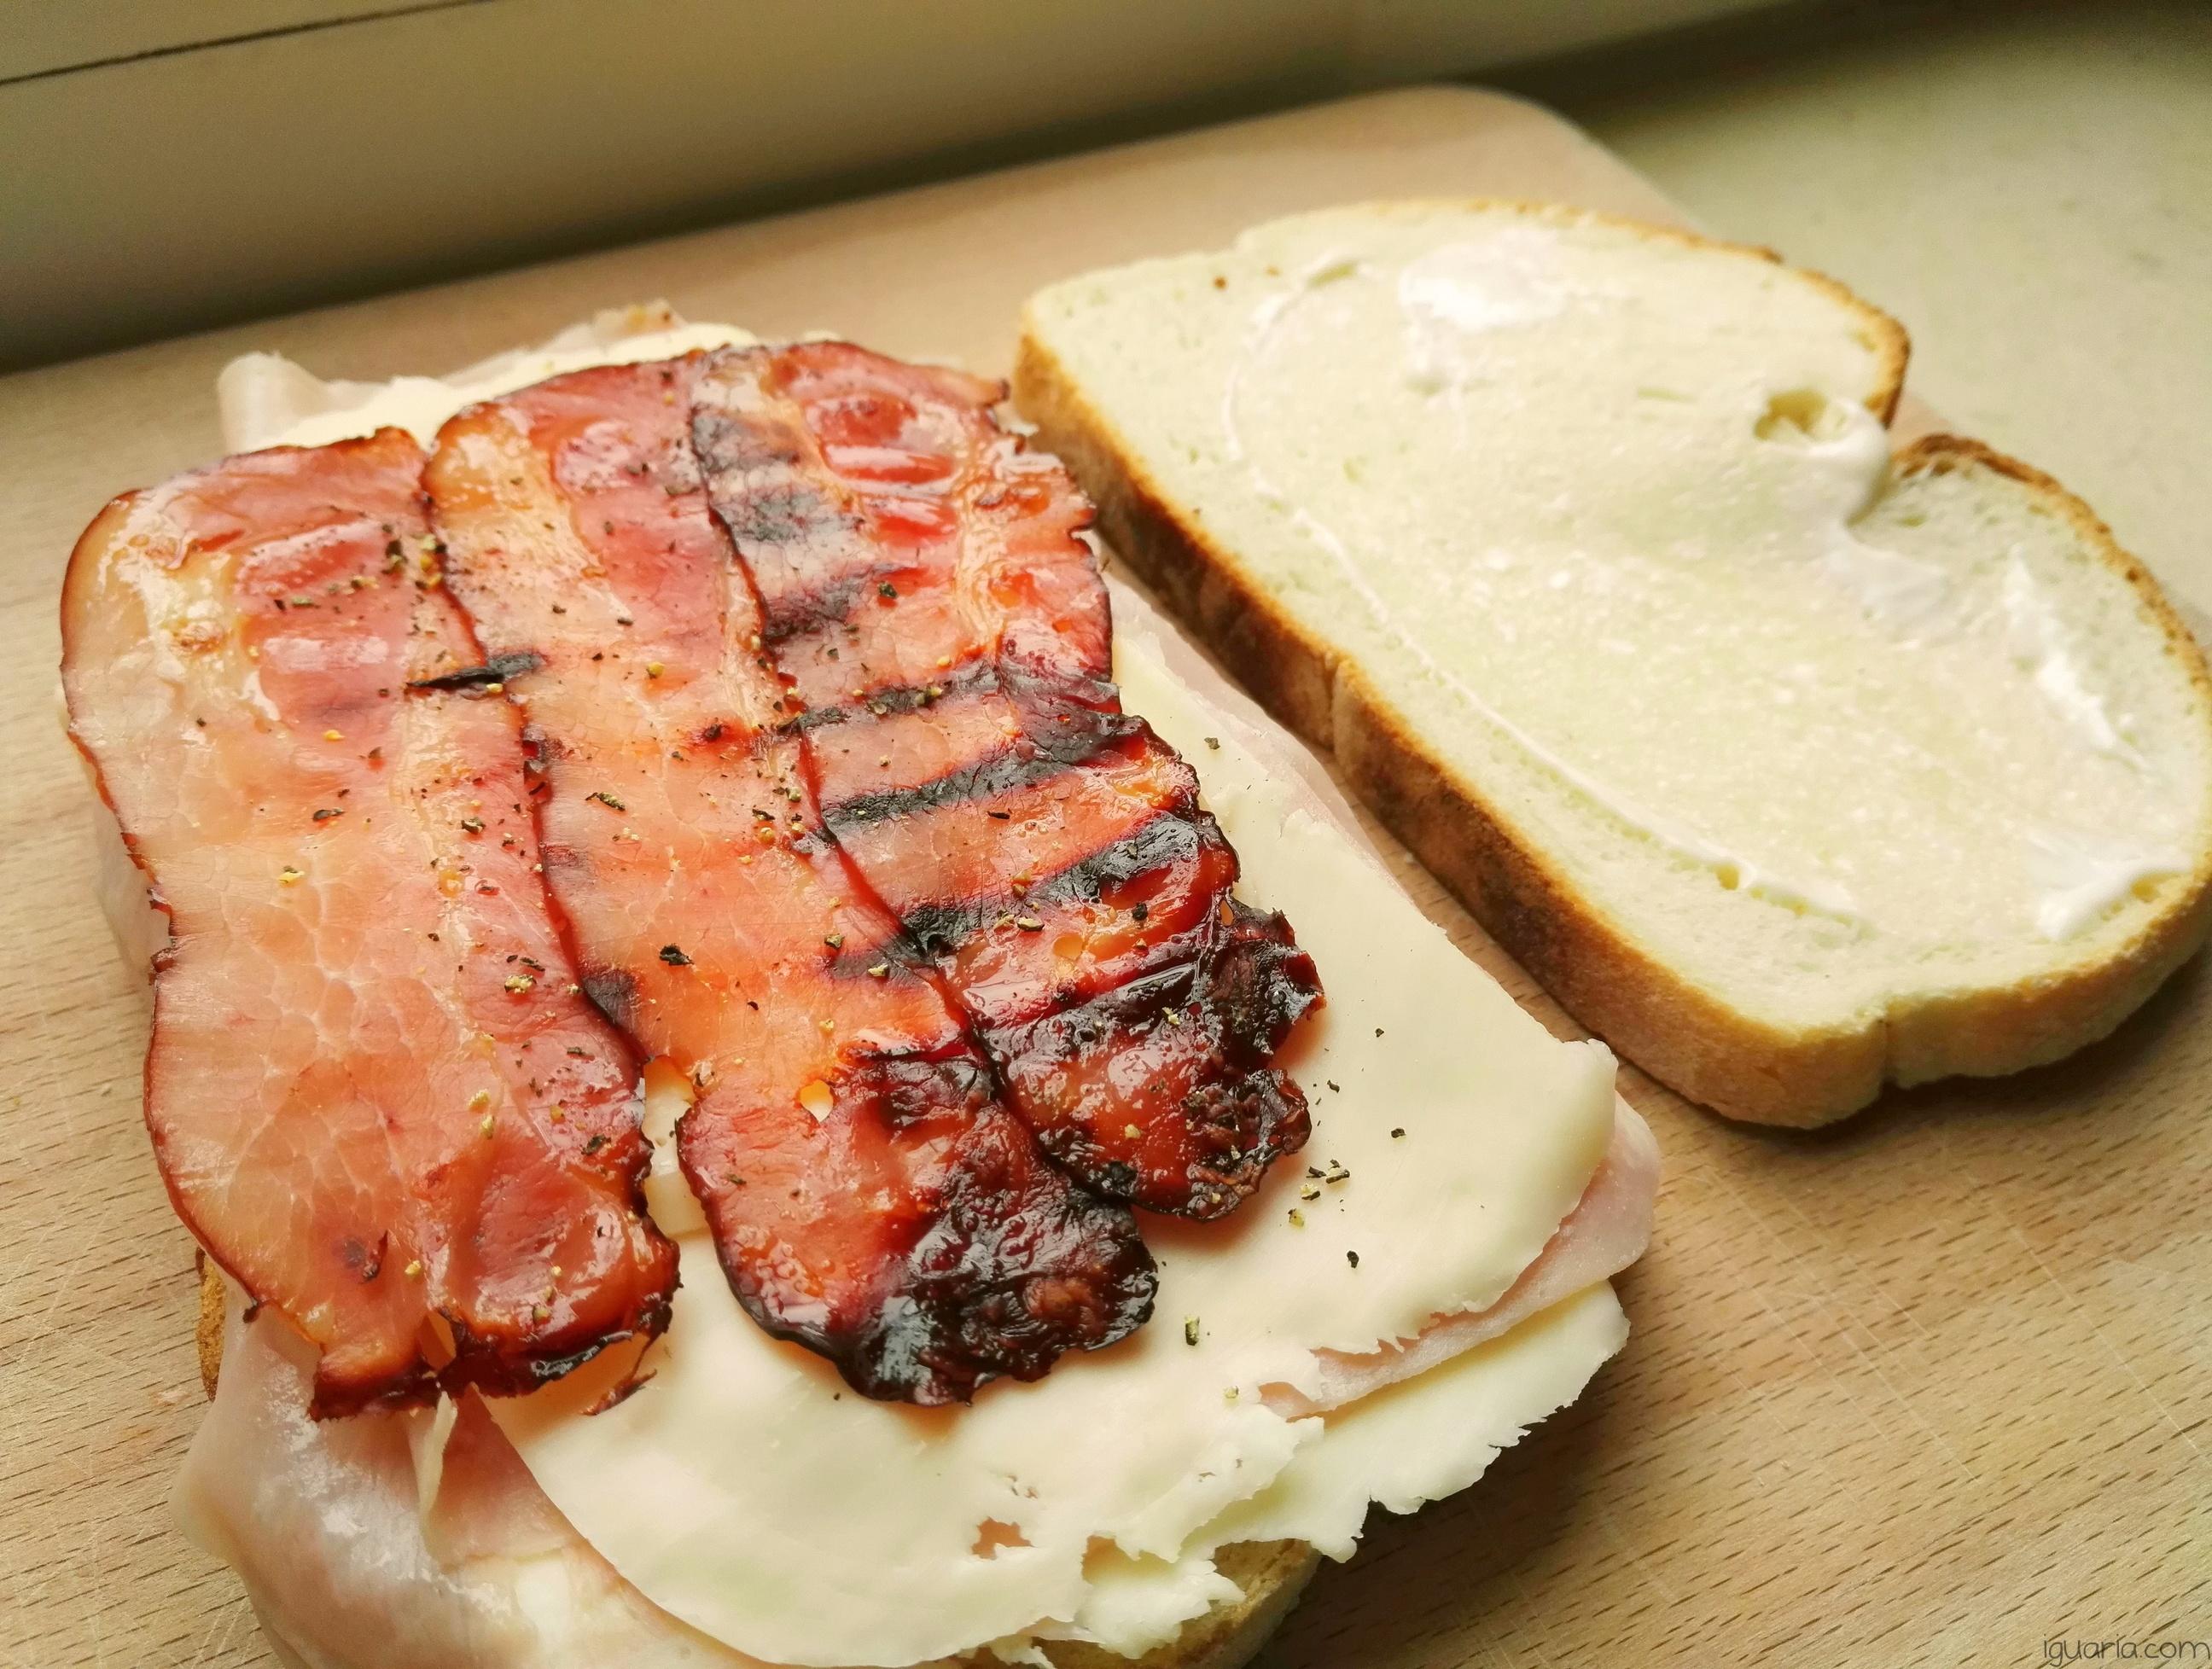 Iguaria_Tosta-Aberta-Adicionar-Bacon